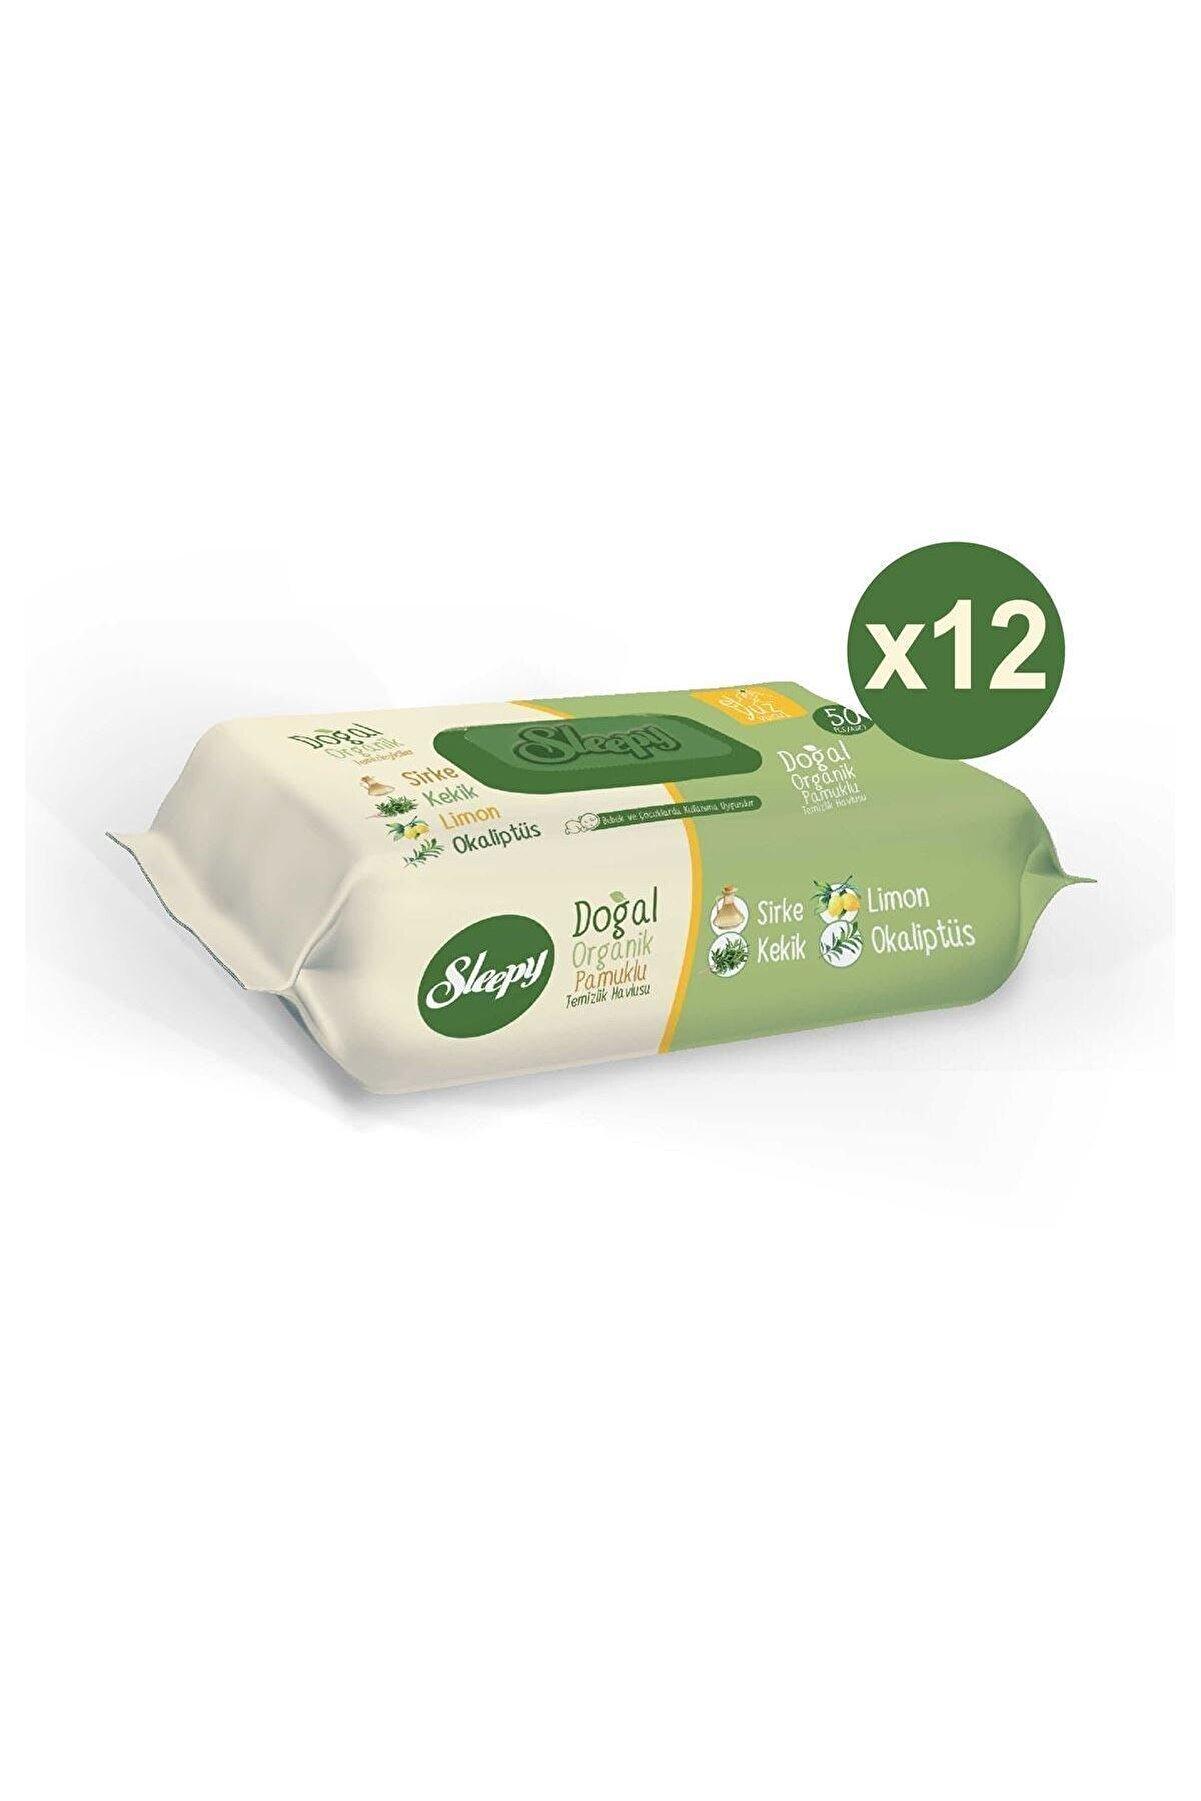 Sleepy Doğal Organik Pamuklu Temizlik Havlusu 12X50